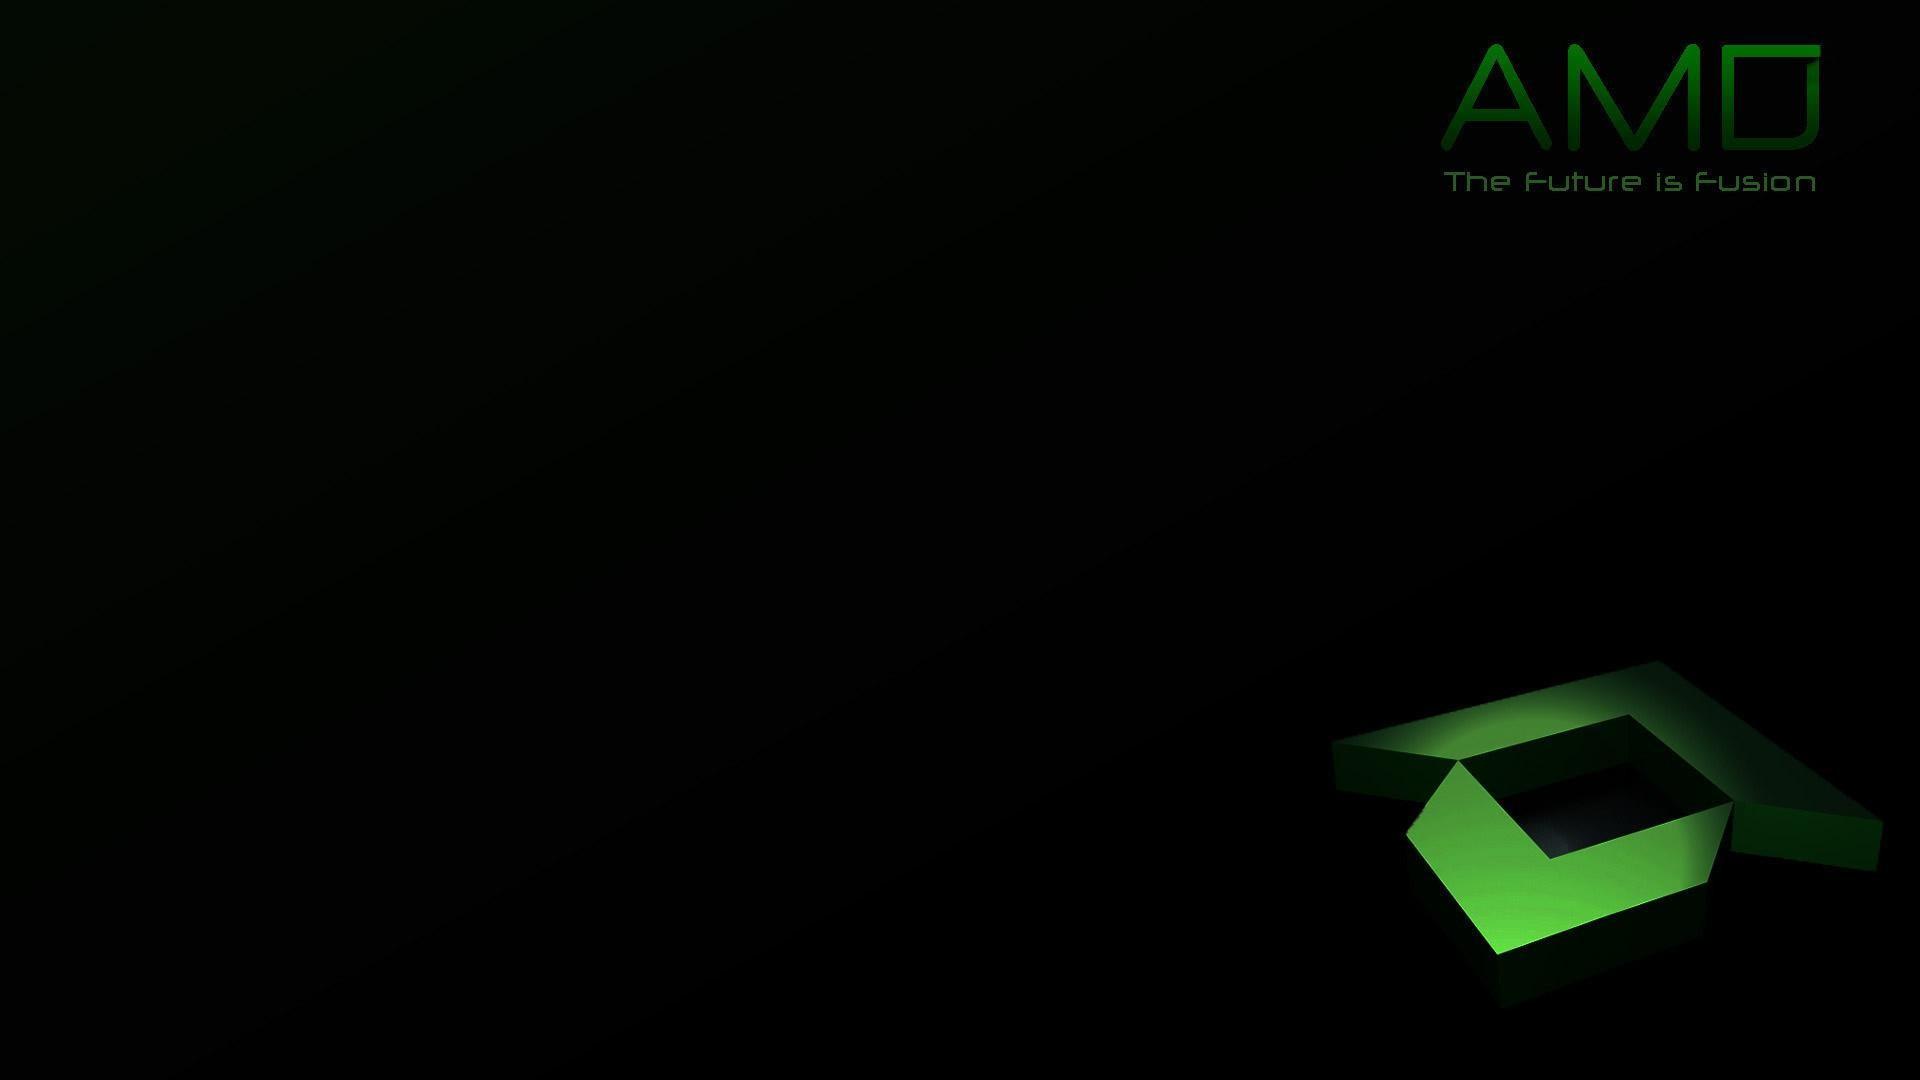 AMD Wallpapers – Wallpaper Cave